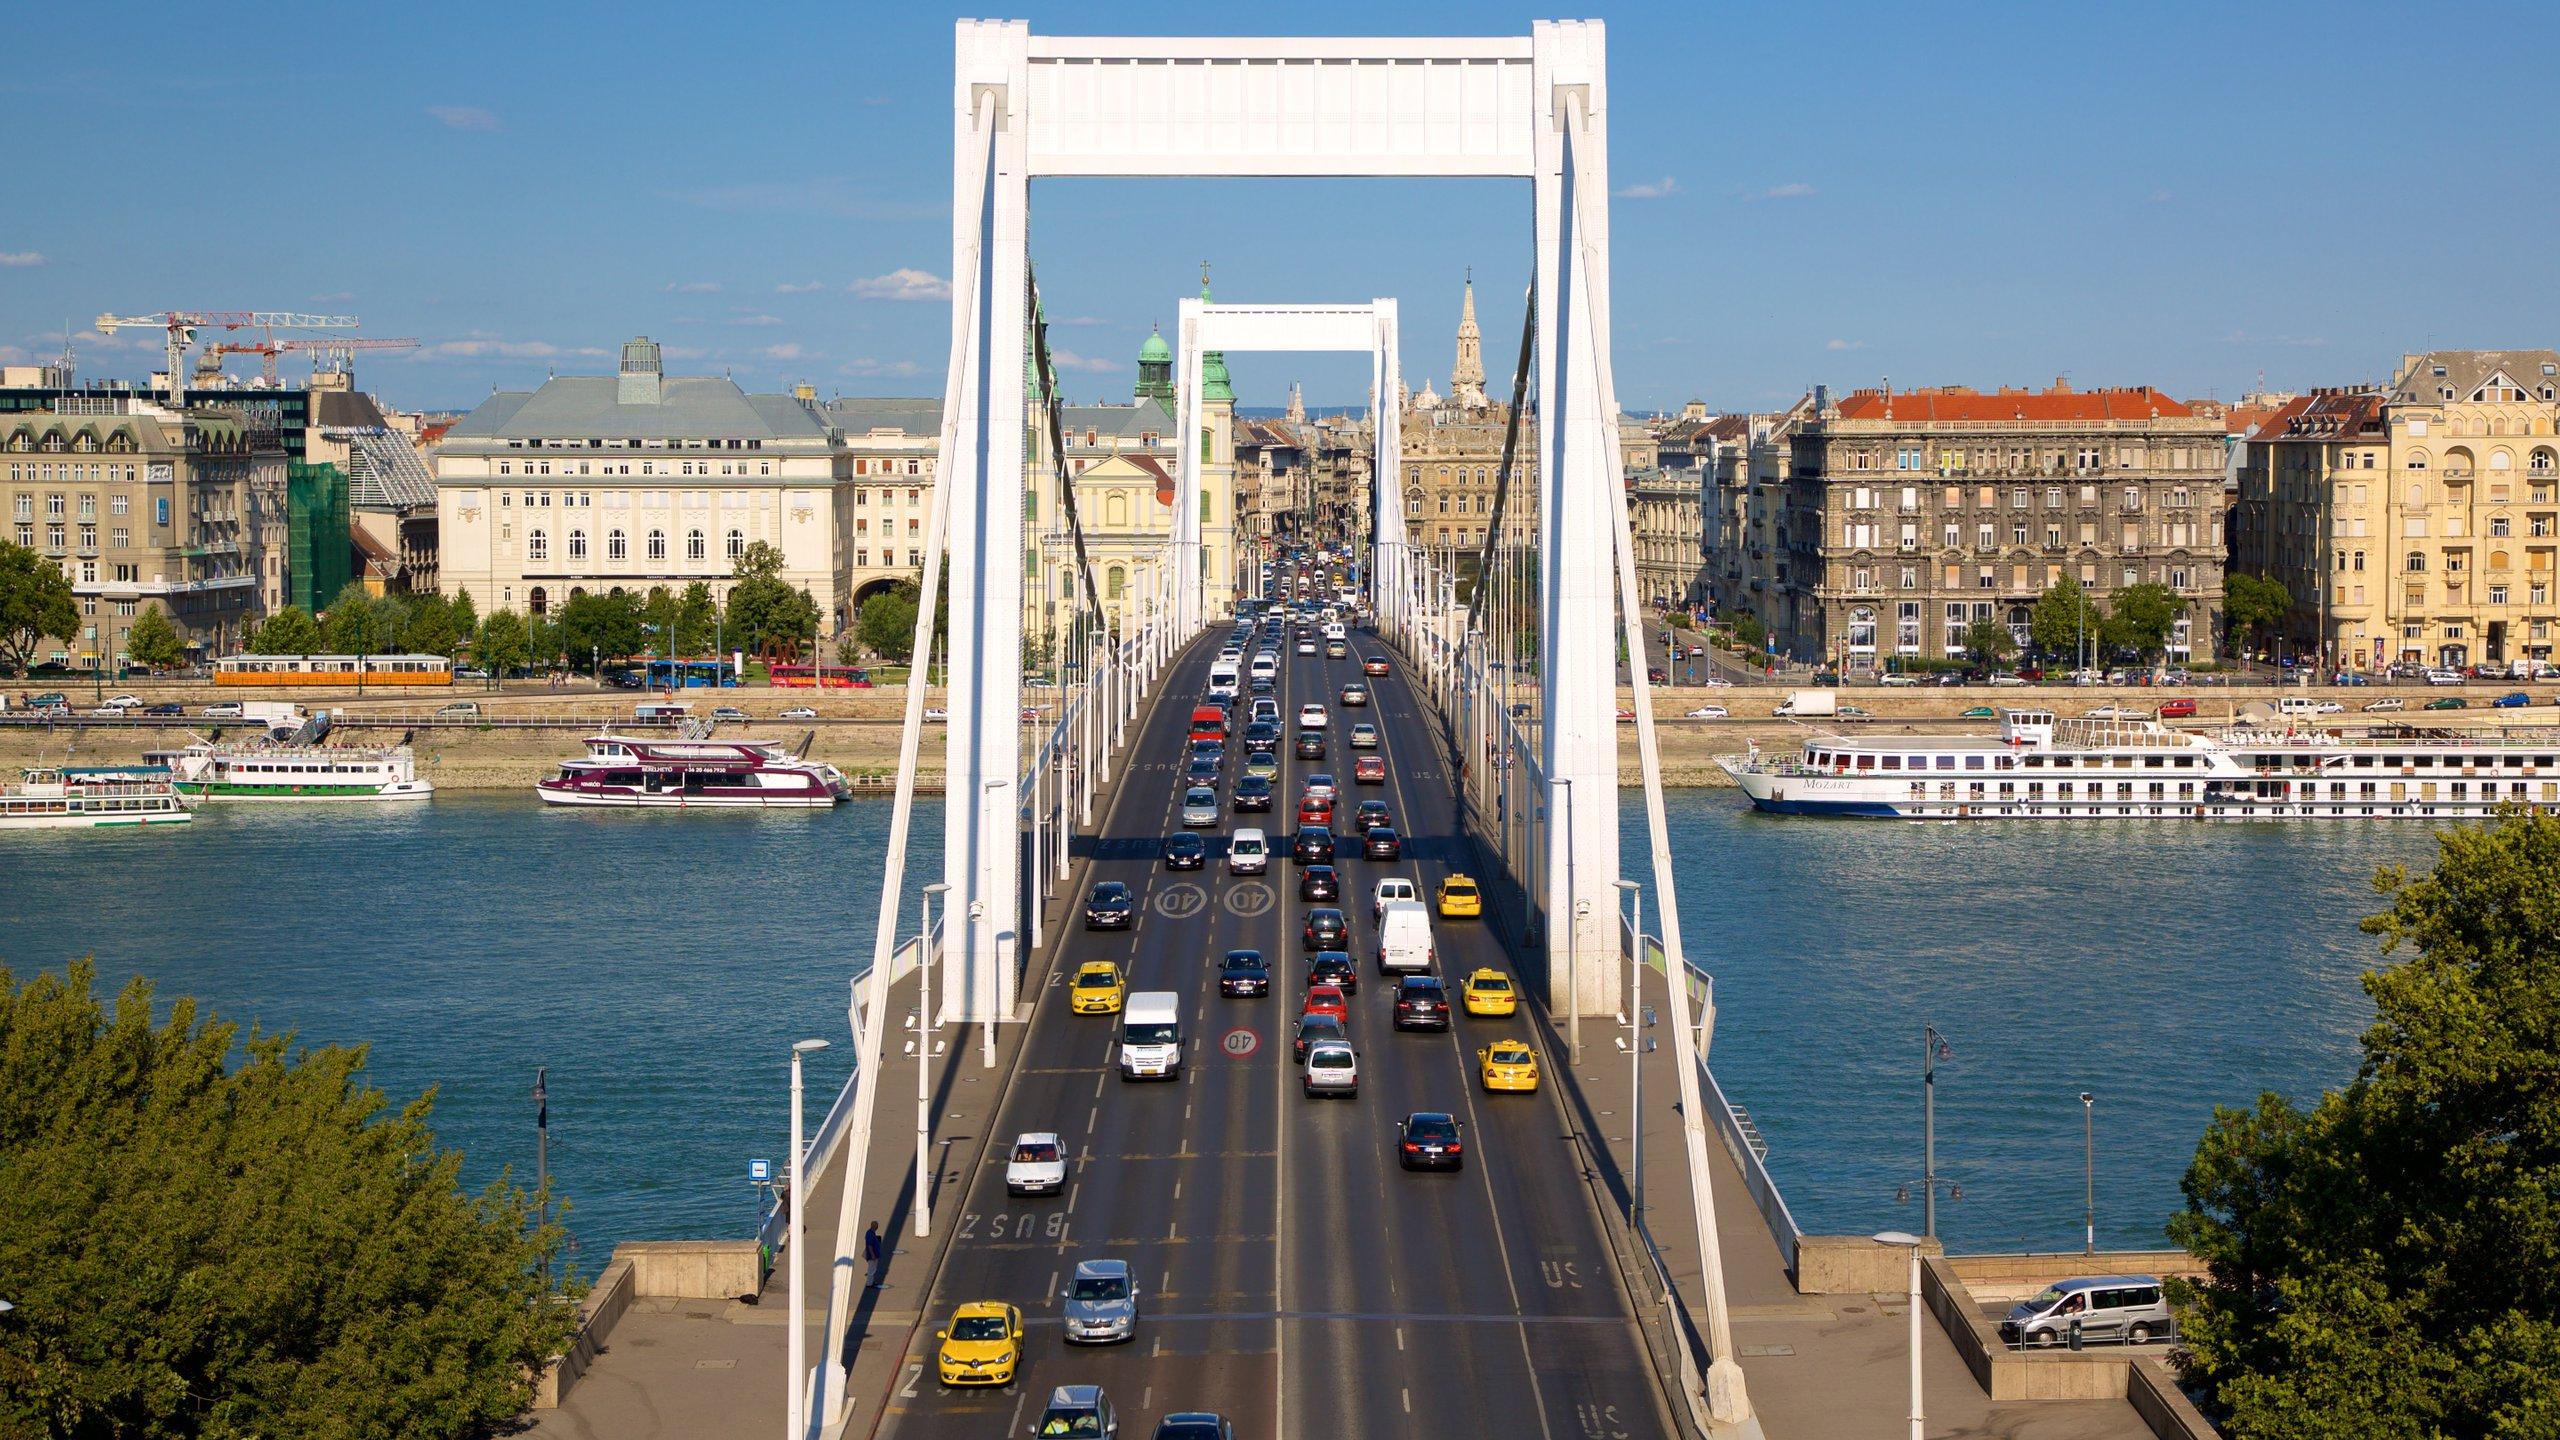 Belső-Ferencváros, Budapest, Hungary